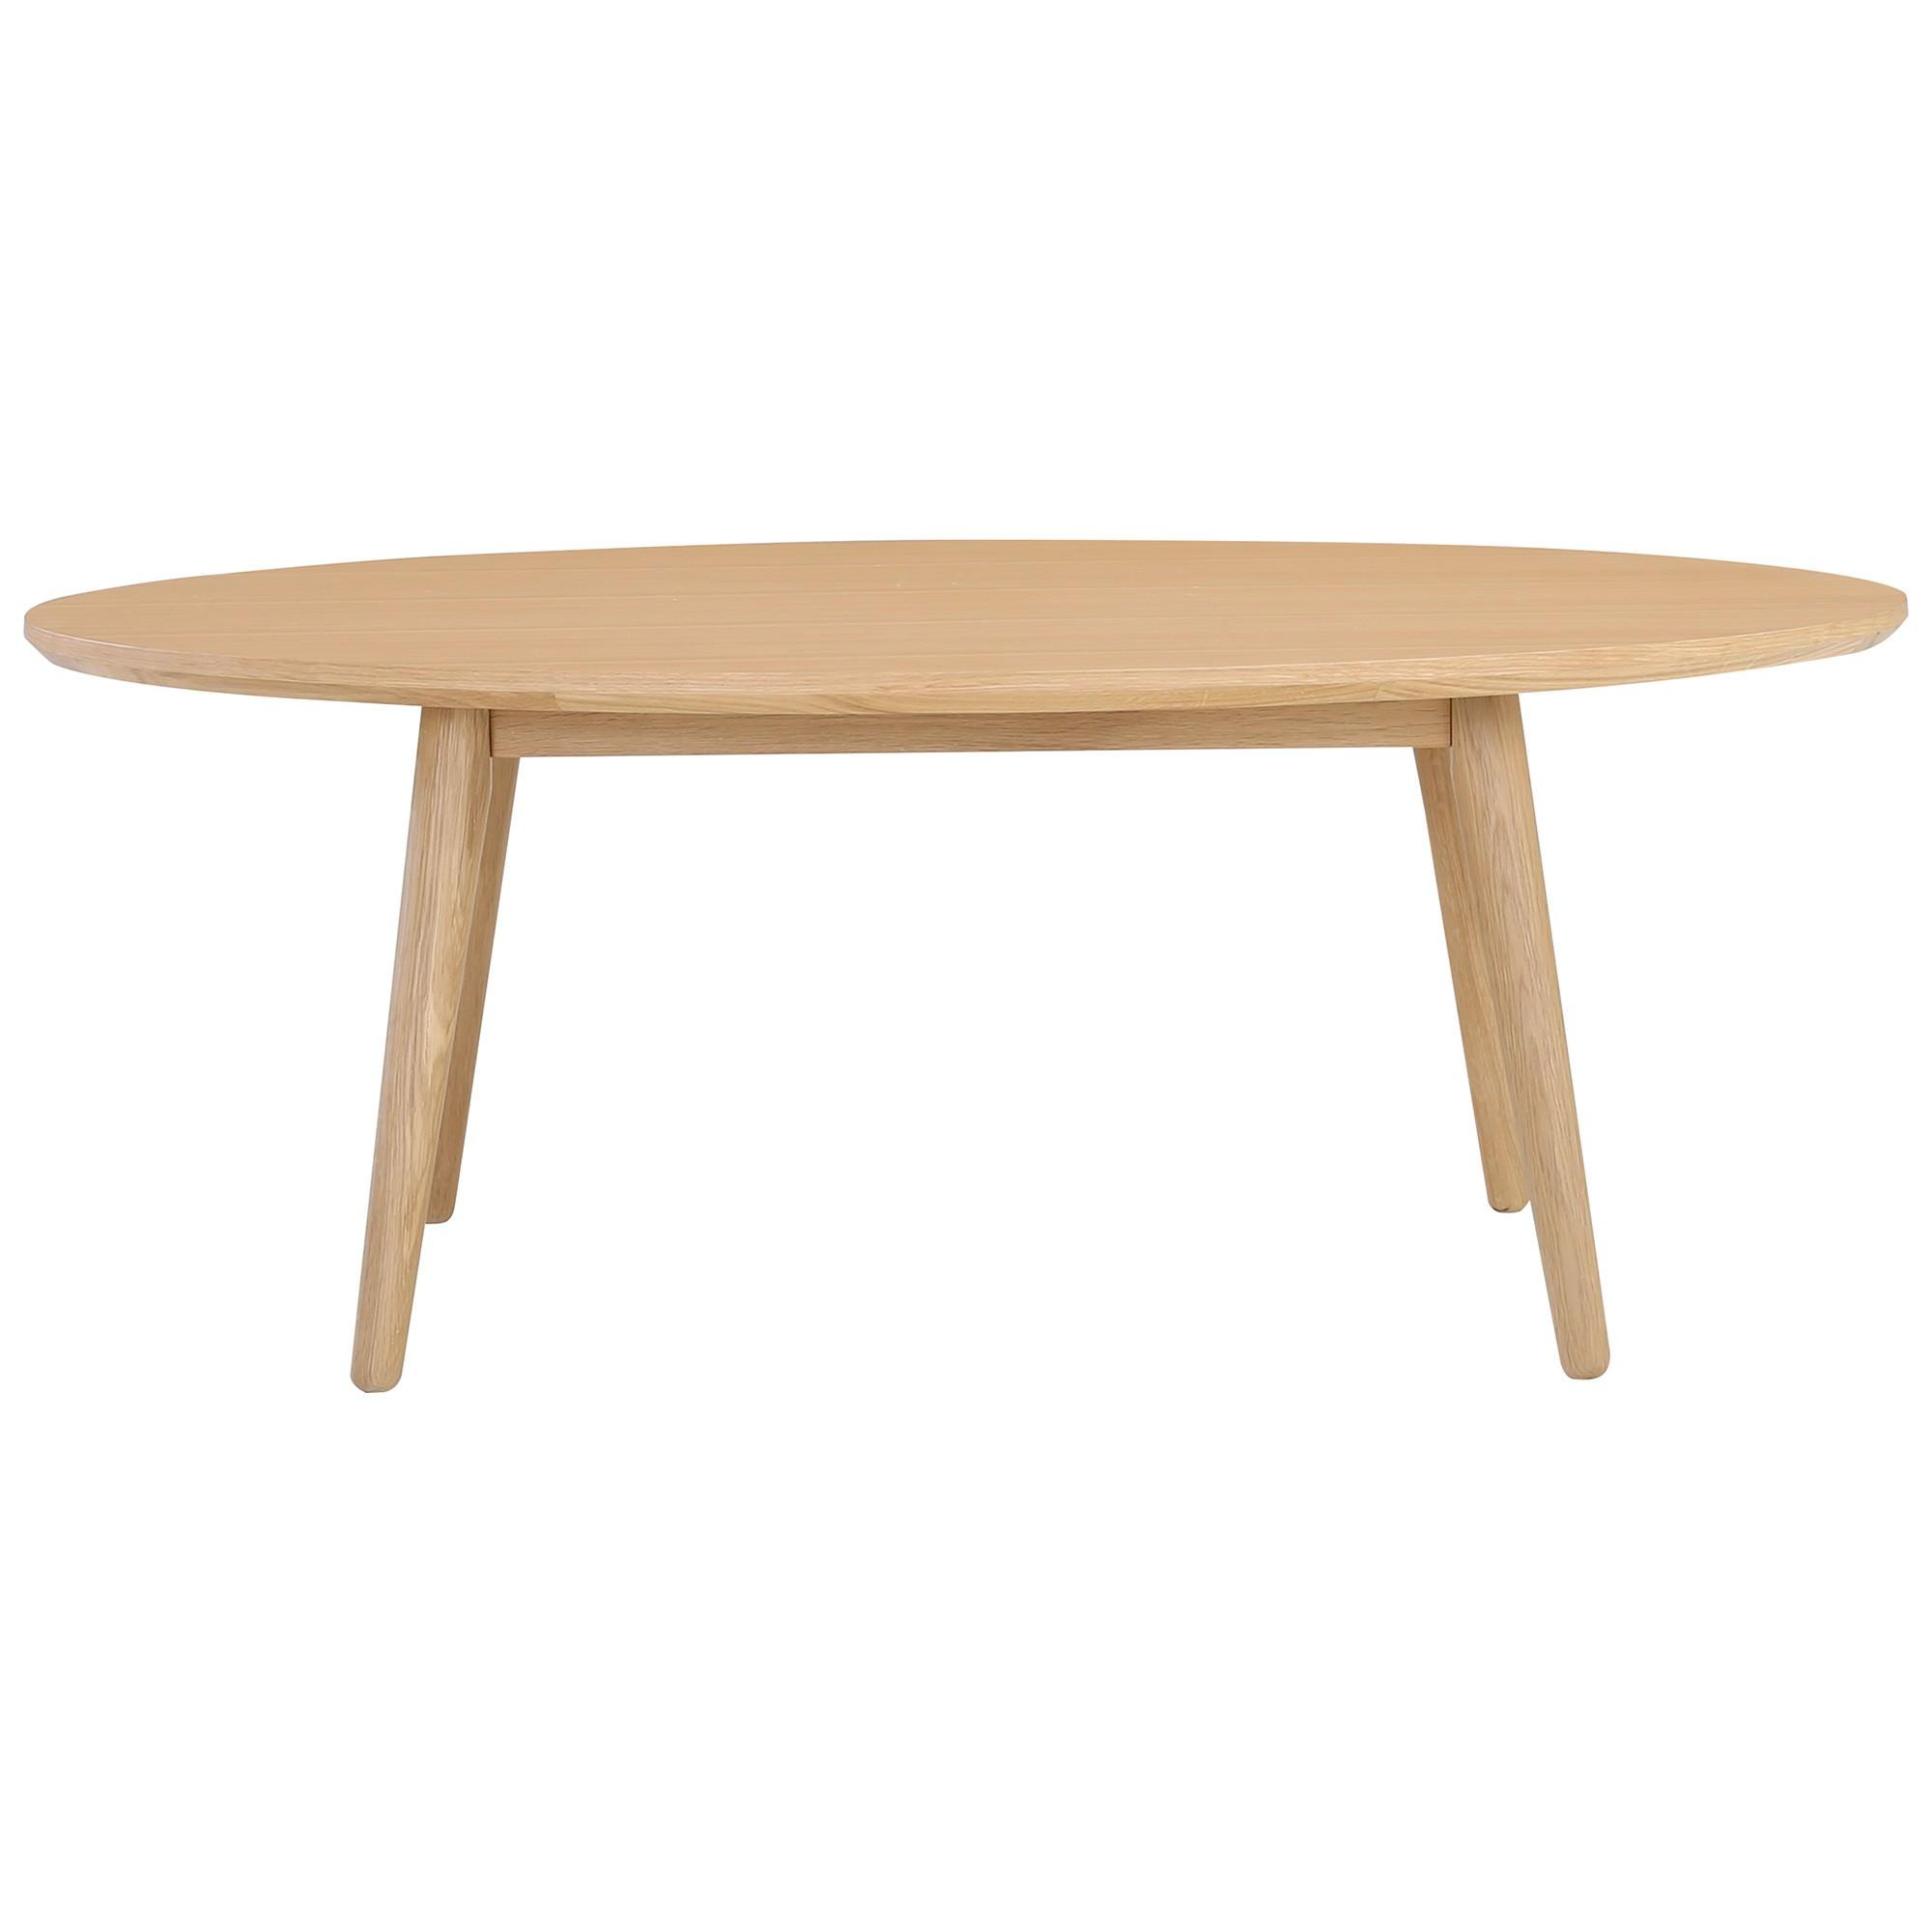 Oringo Commercial Grade Oak Timber Oval Coffee Table, 118cm